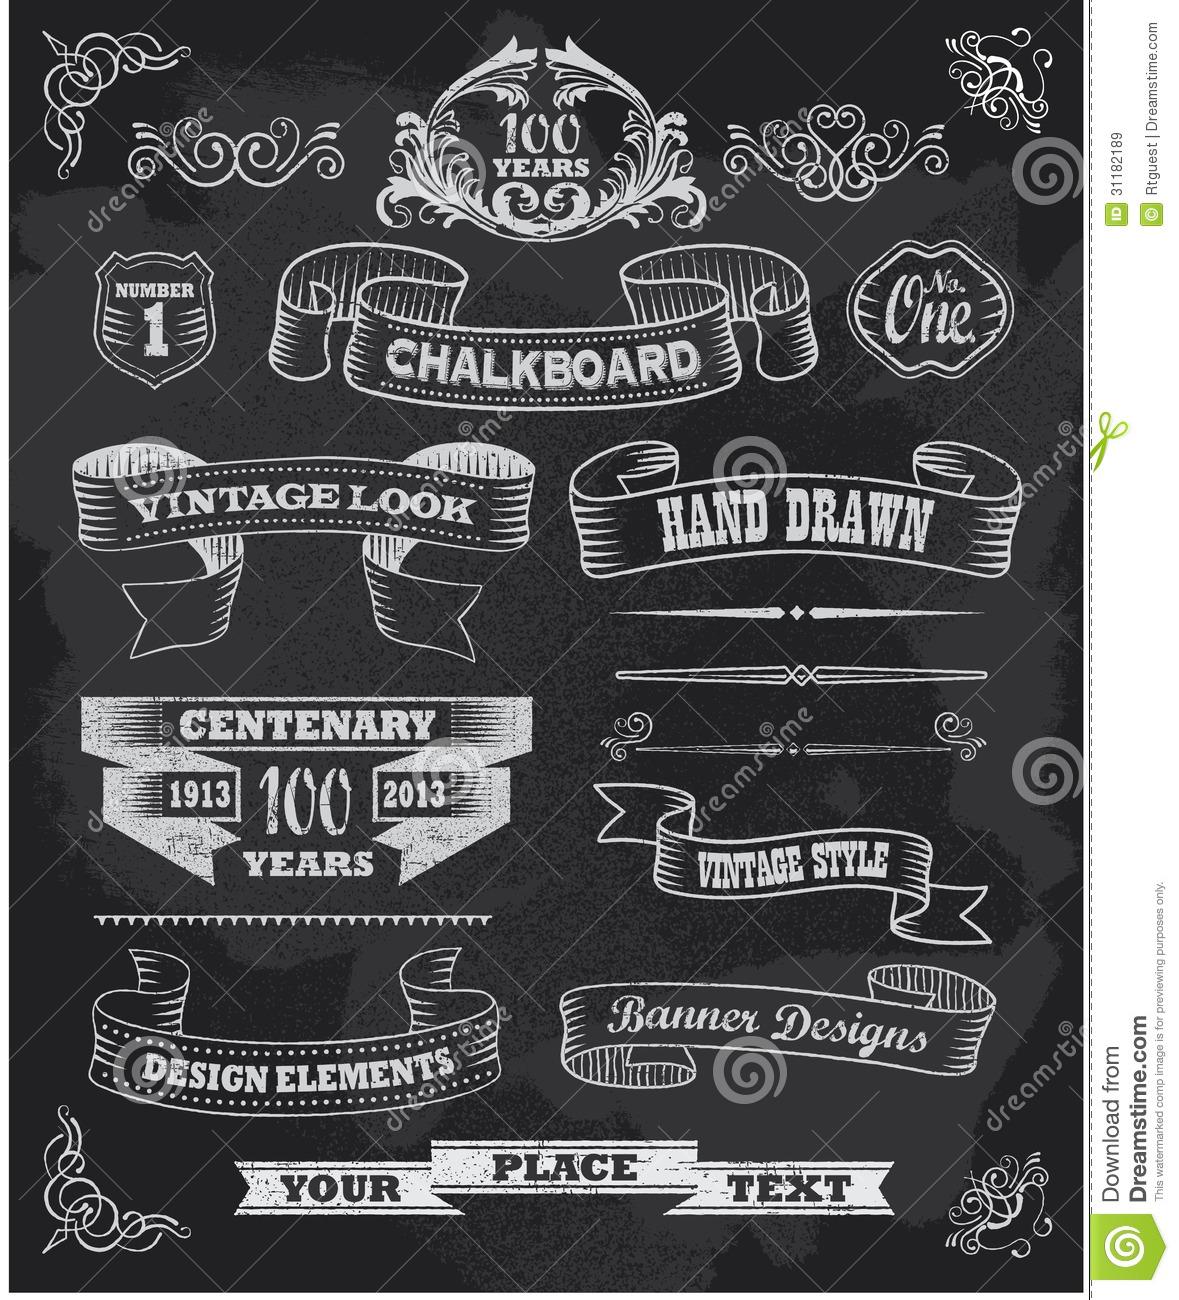 Free chalkboard clip art graphic free stock Free Chalkboard Clipart & Chalkboard Clip Art Images - ClipartALL.com graphic free stock